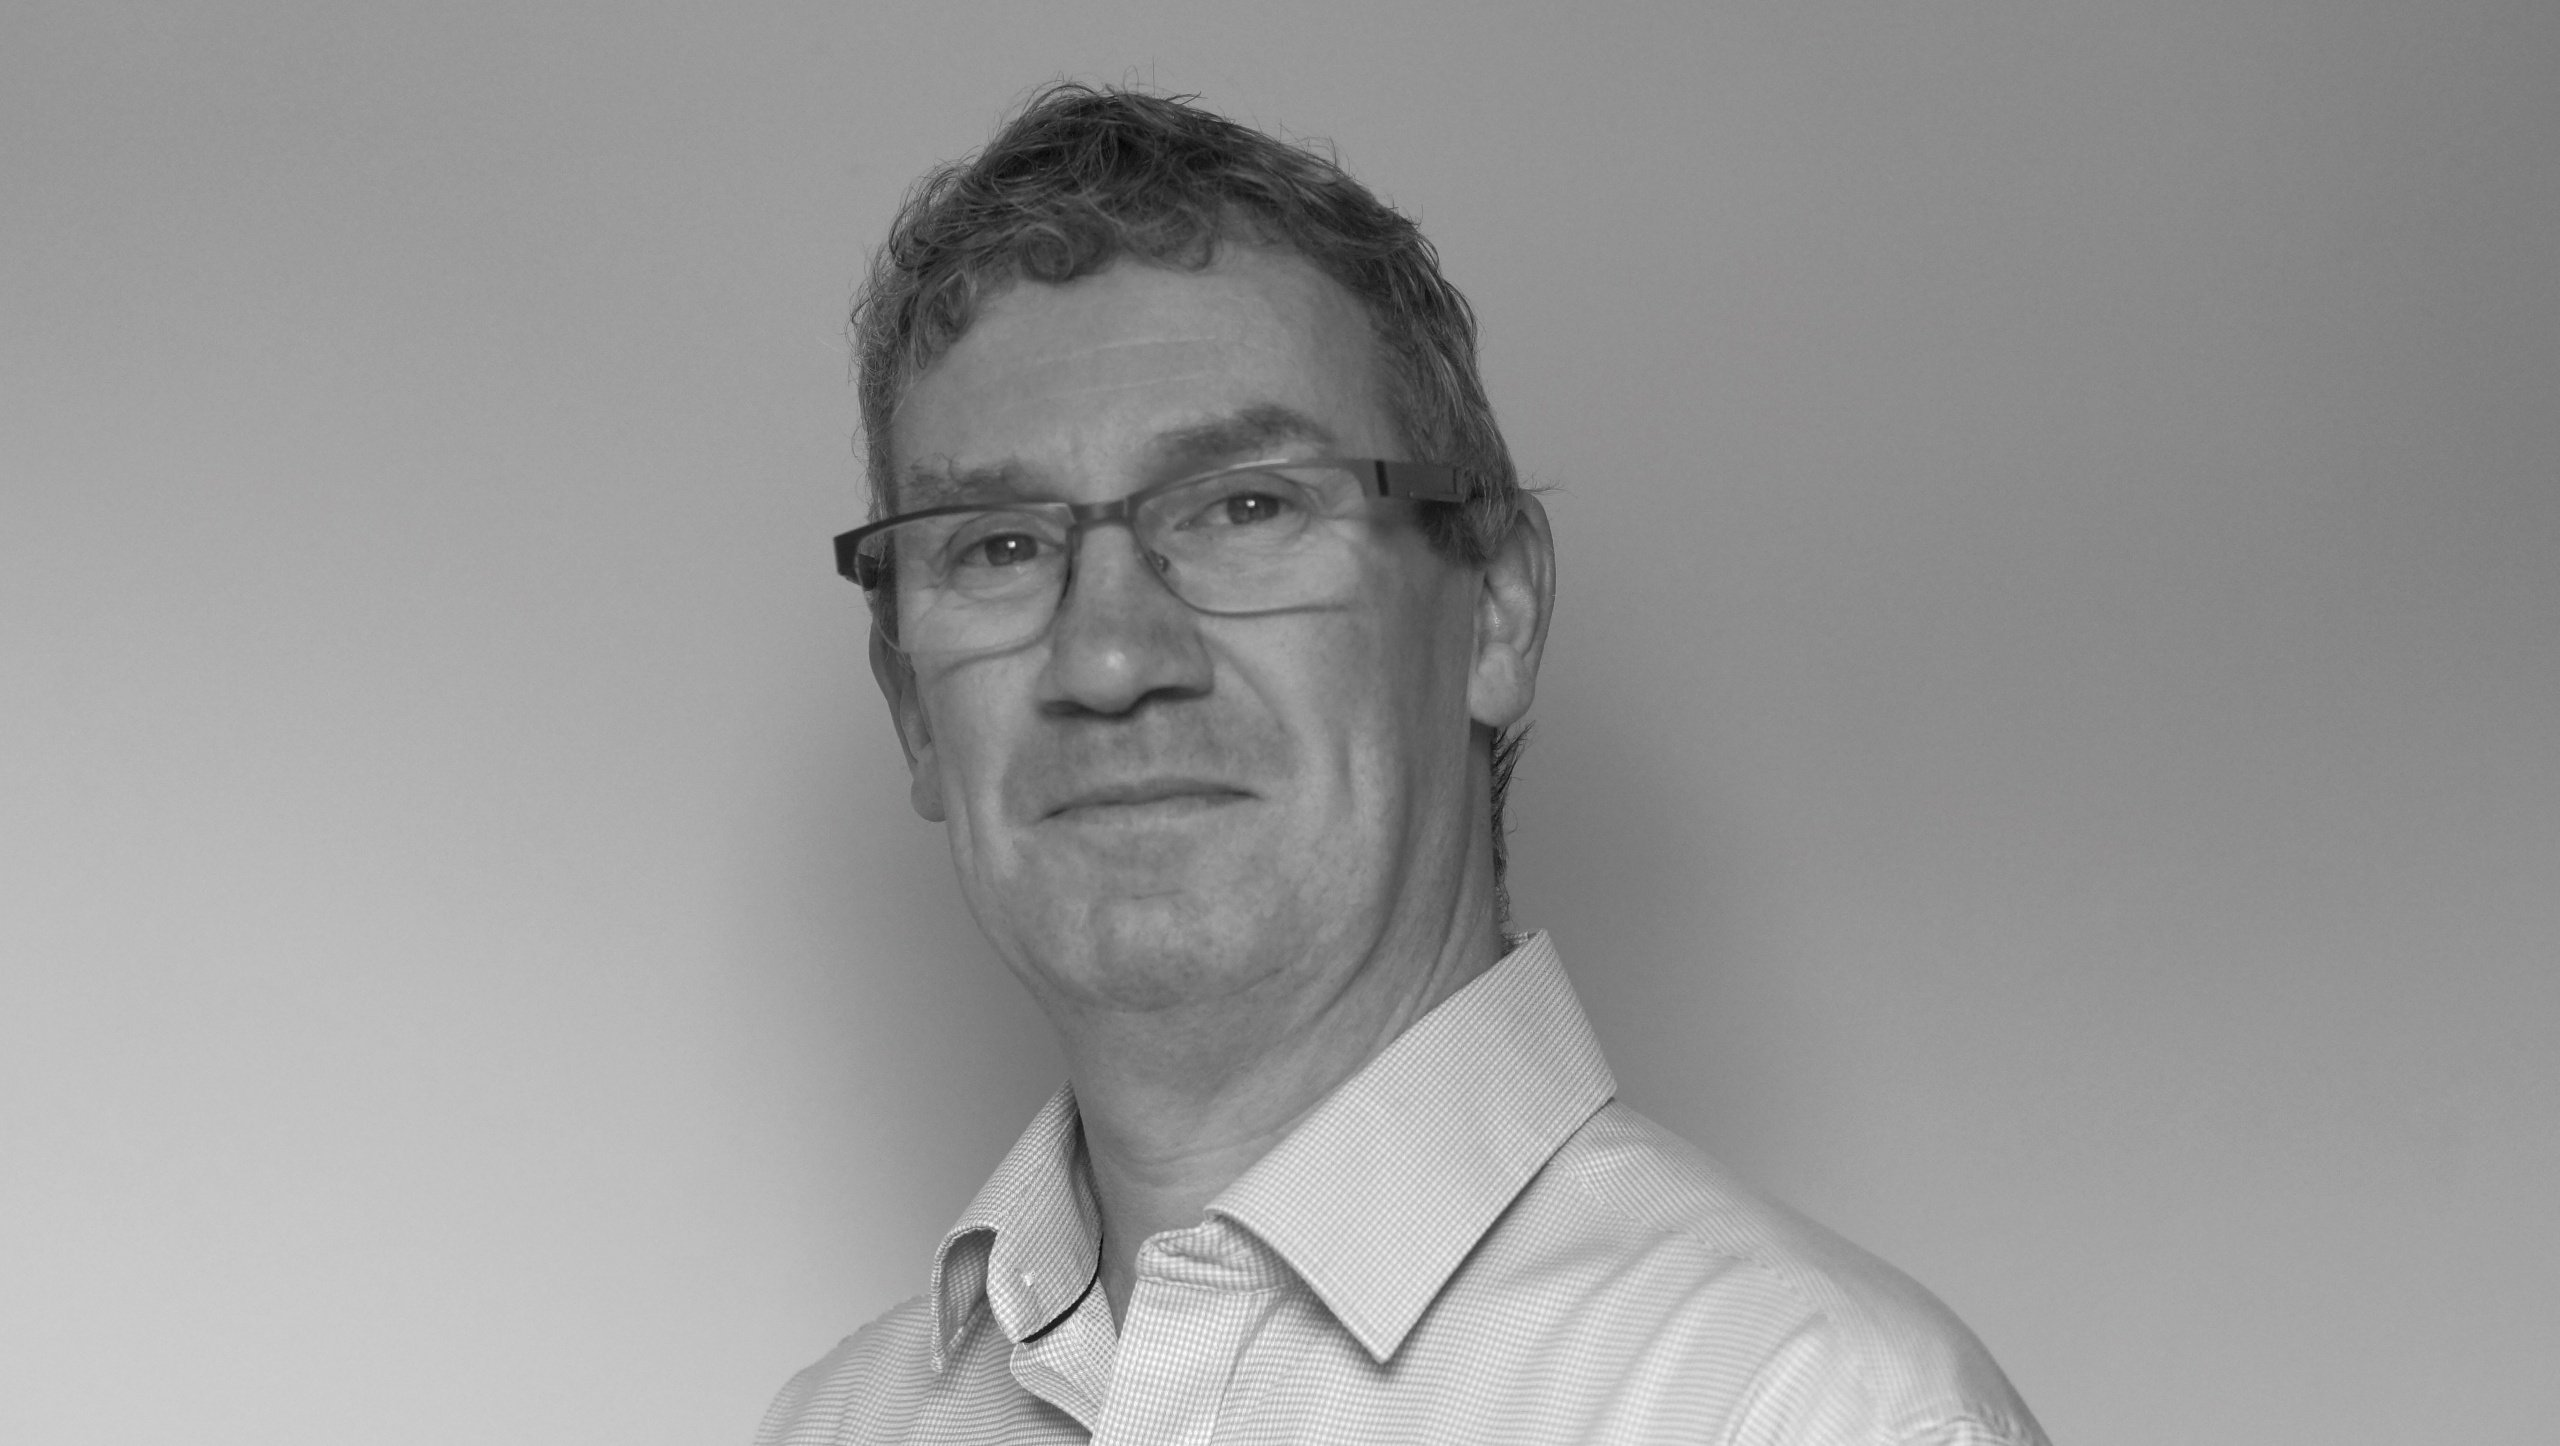 Peter Hawkin